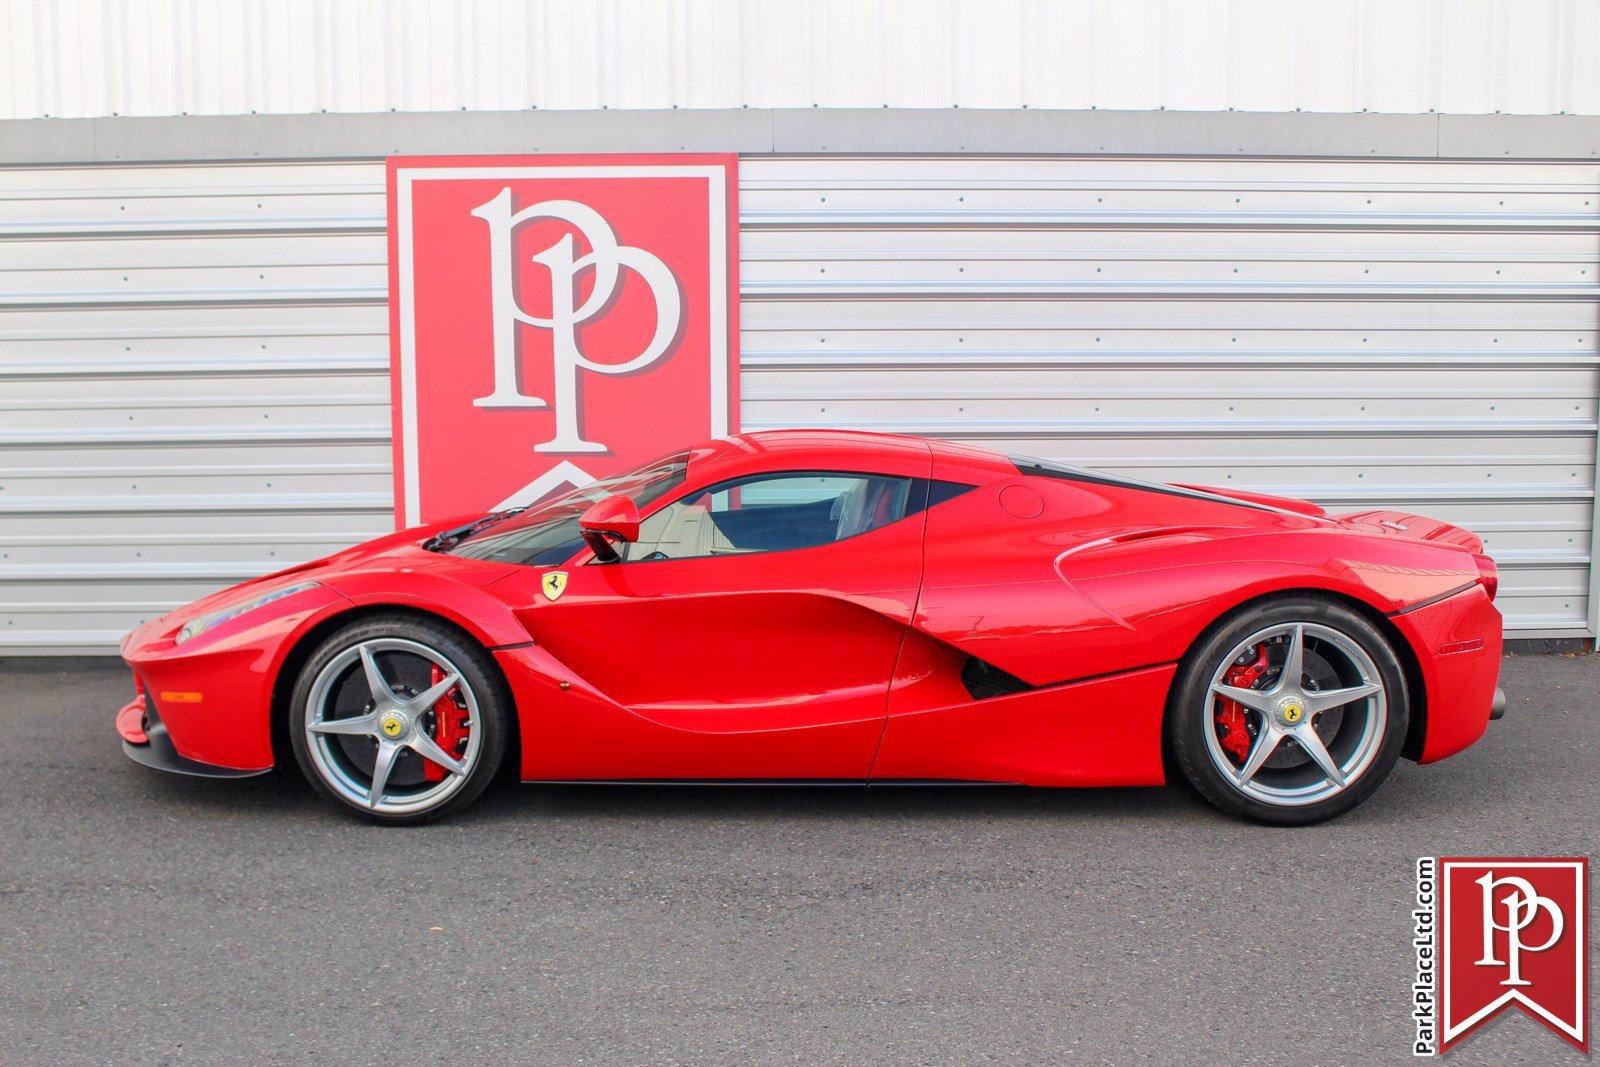 2014_Ferrari_LaFerrari_sale-0001